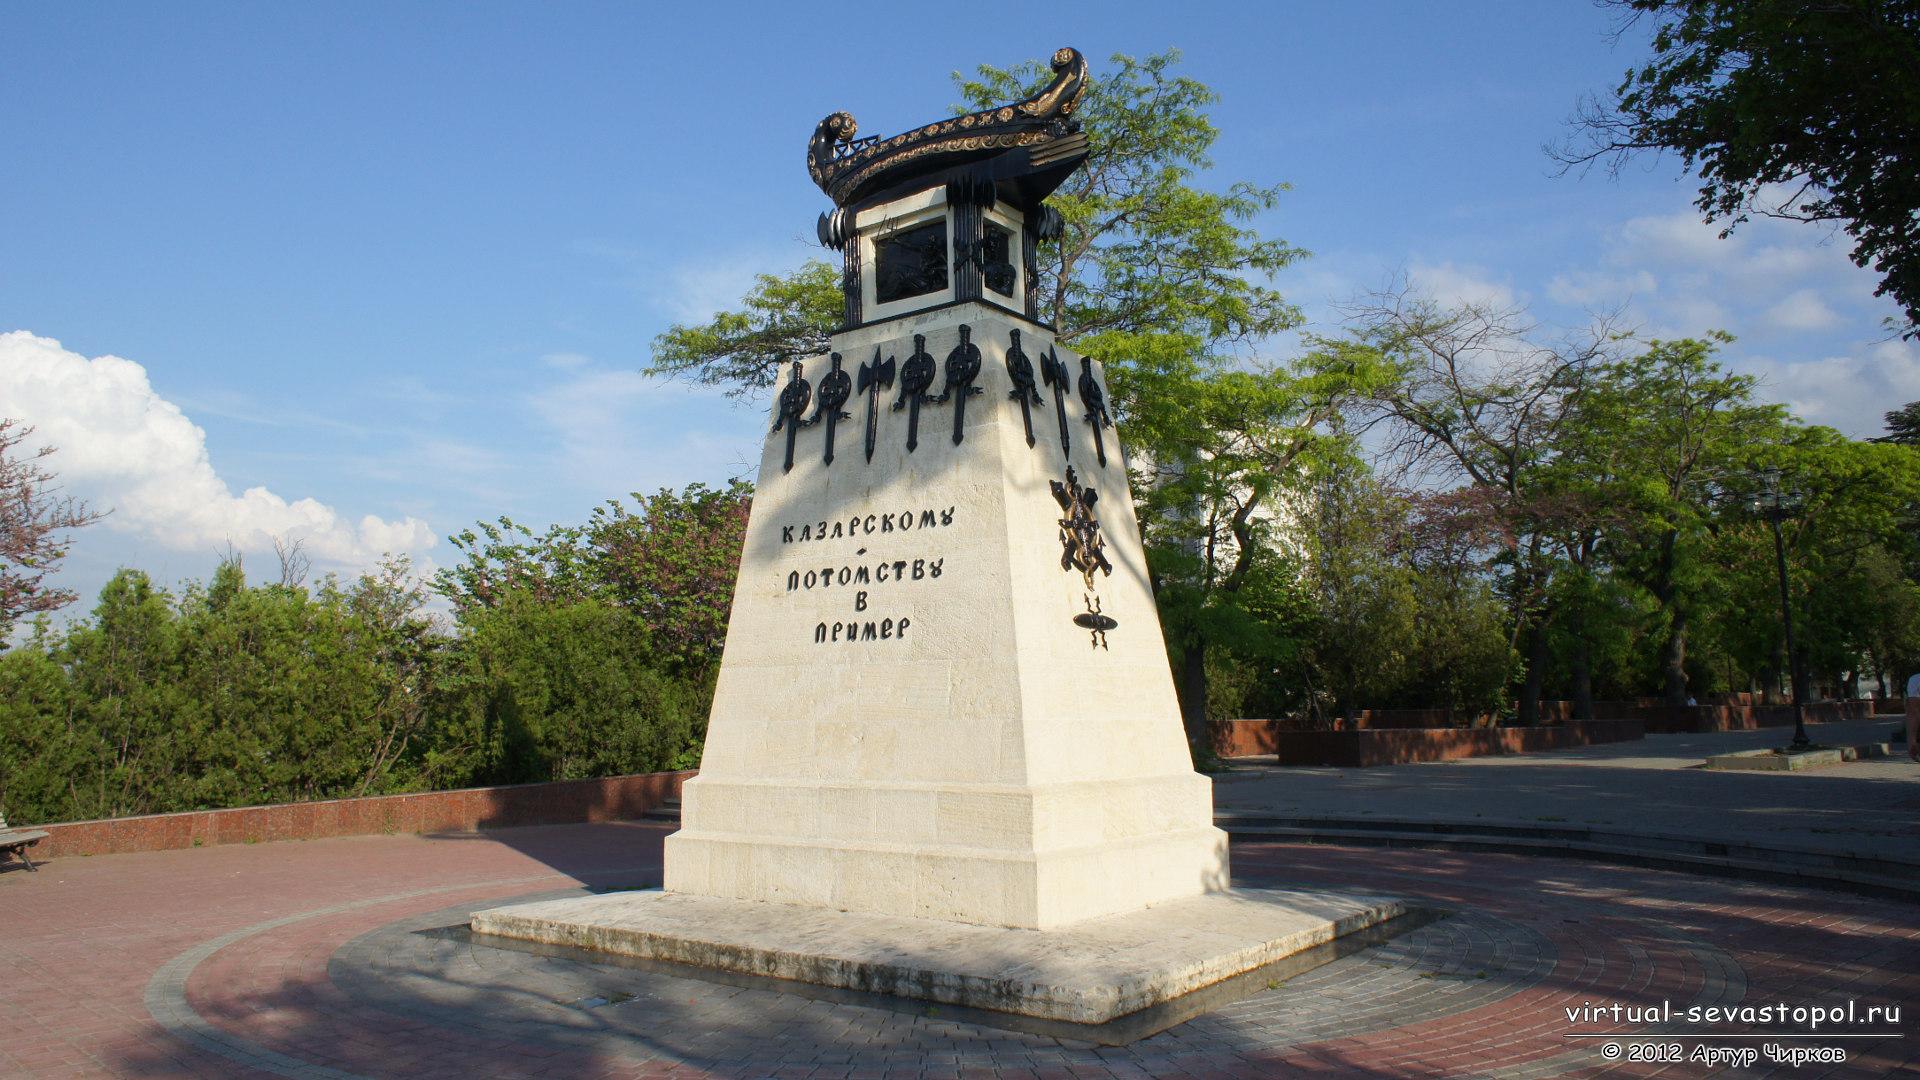 Фото: Памятник Казарскому